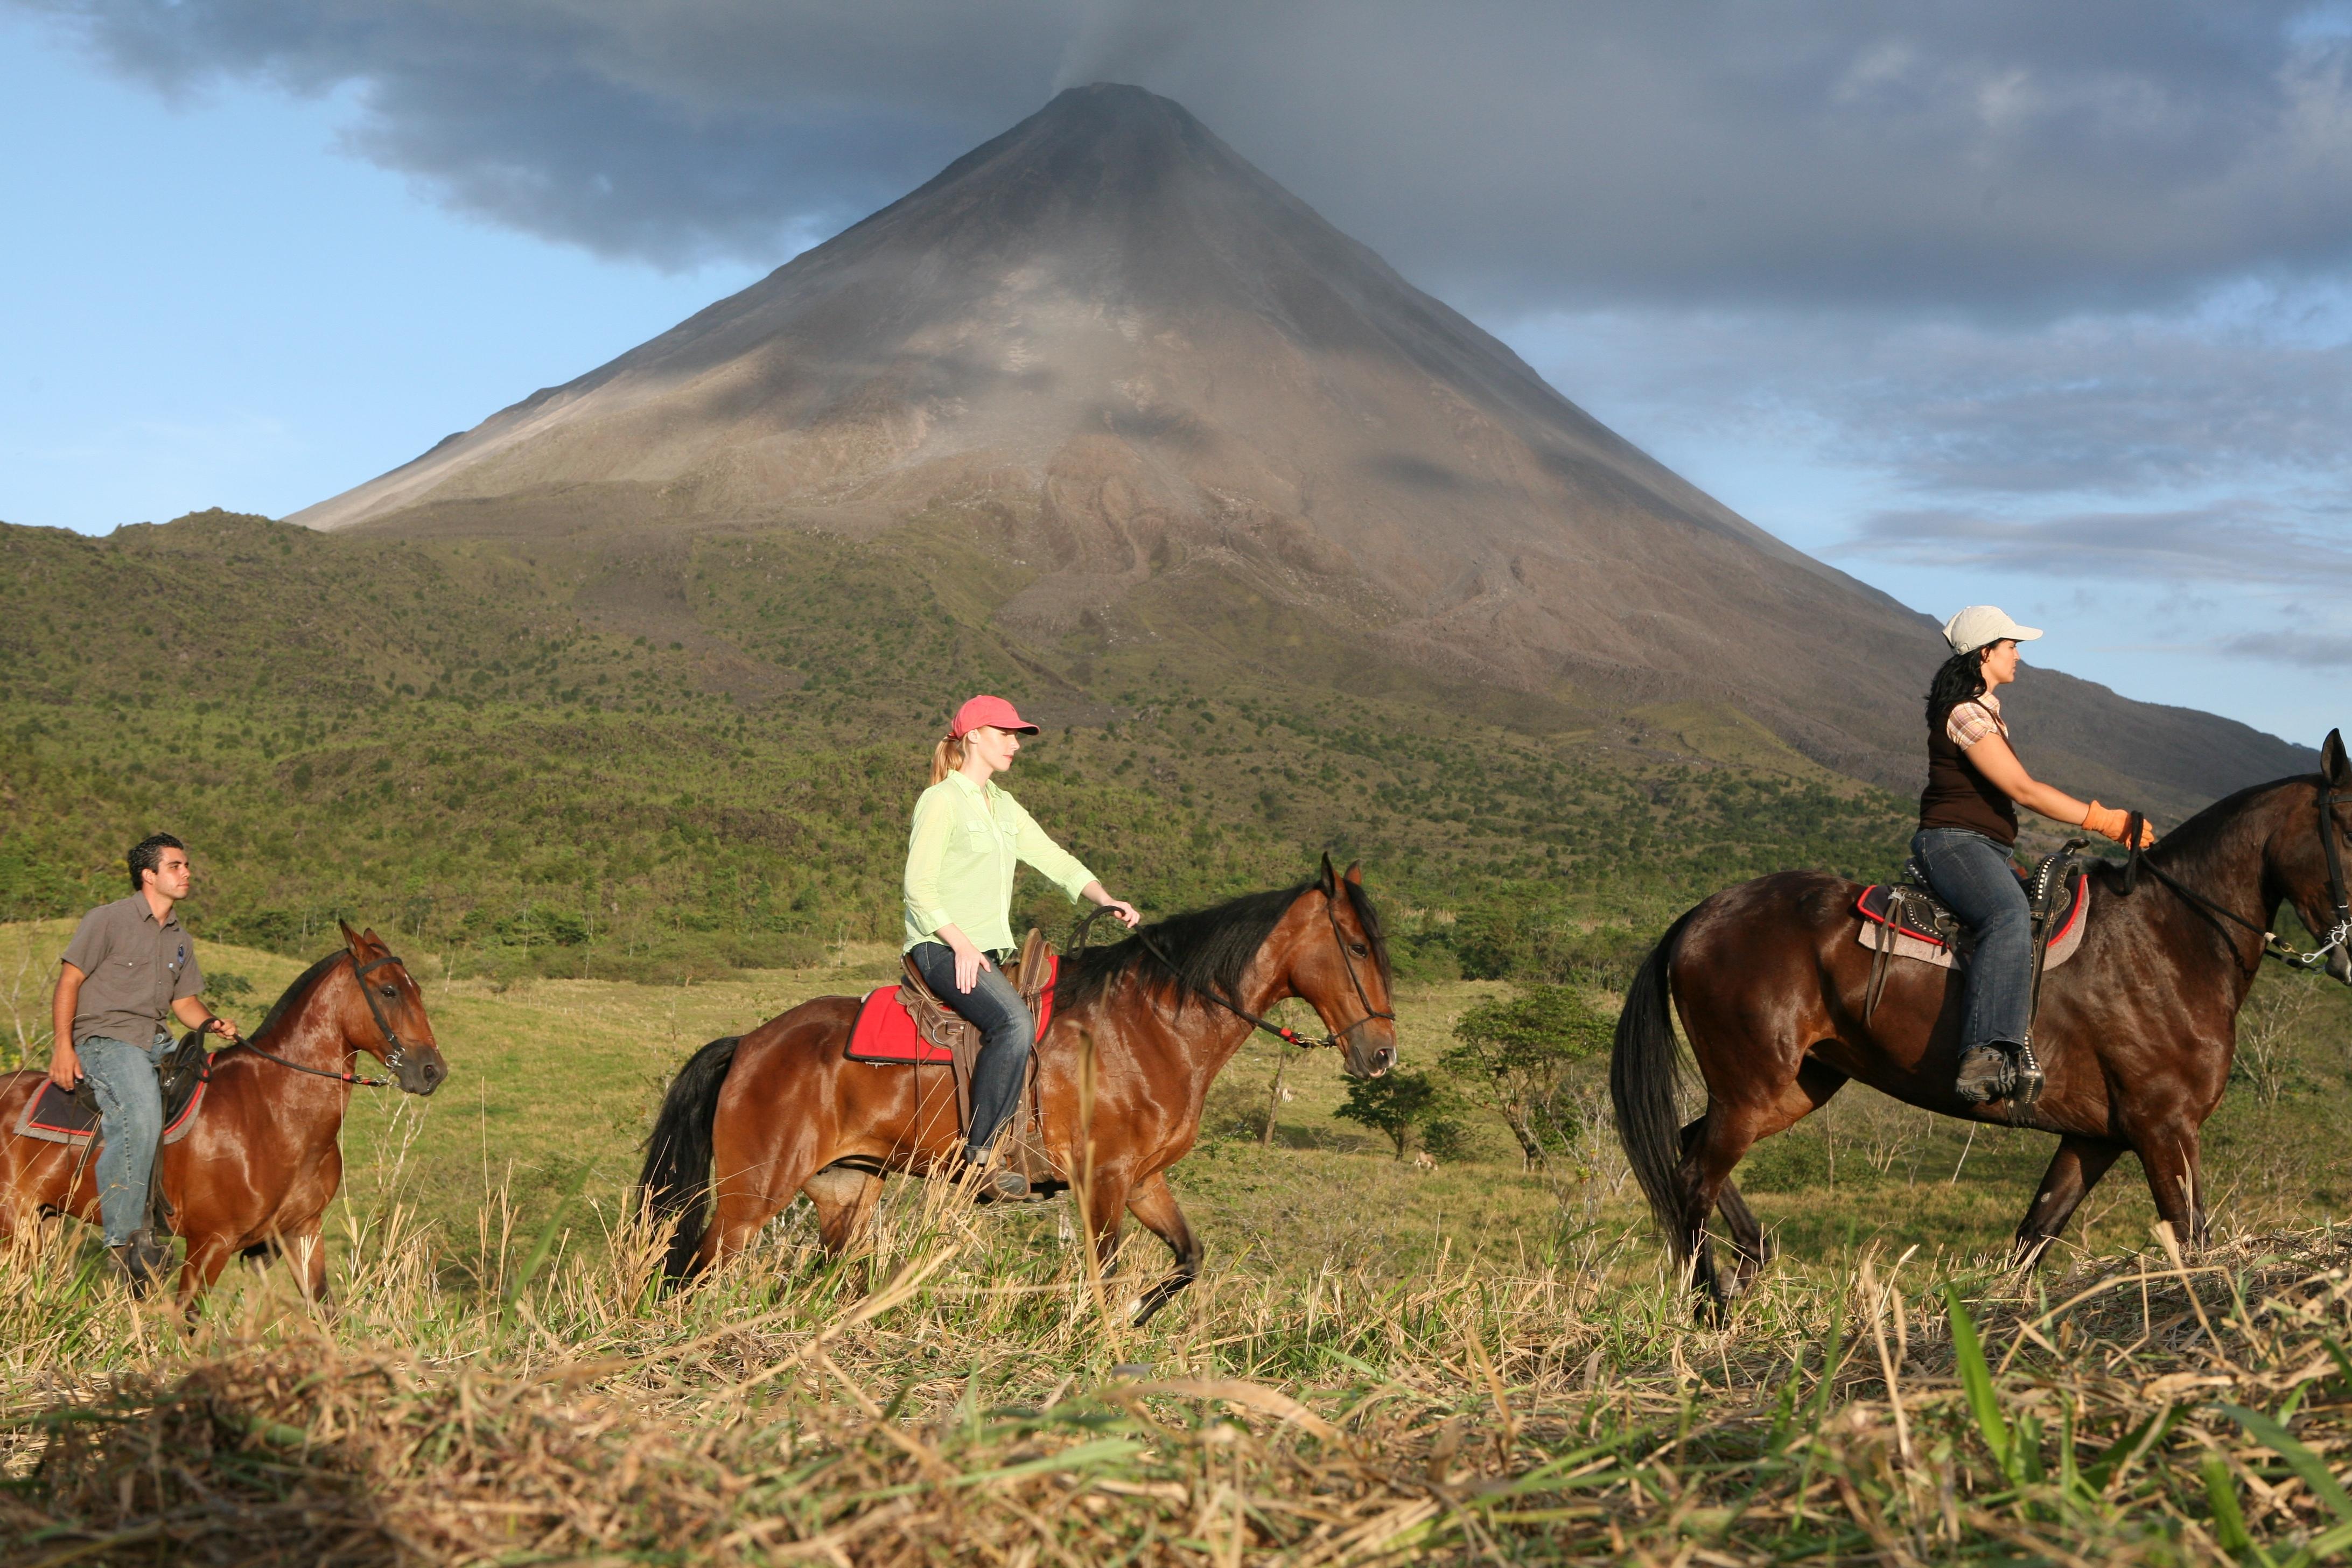 Monica Elizondo, Darley Newman, and Sebastian Mora ride the base of Arenal Volcano  in Costa Rica, as part of Equitrekking Costa Rica.